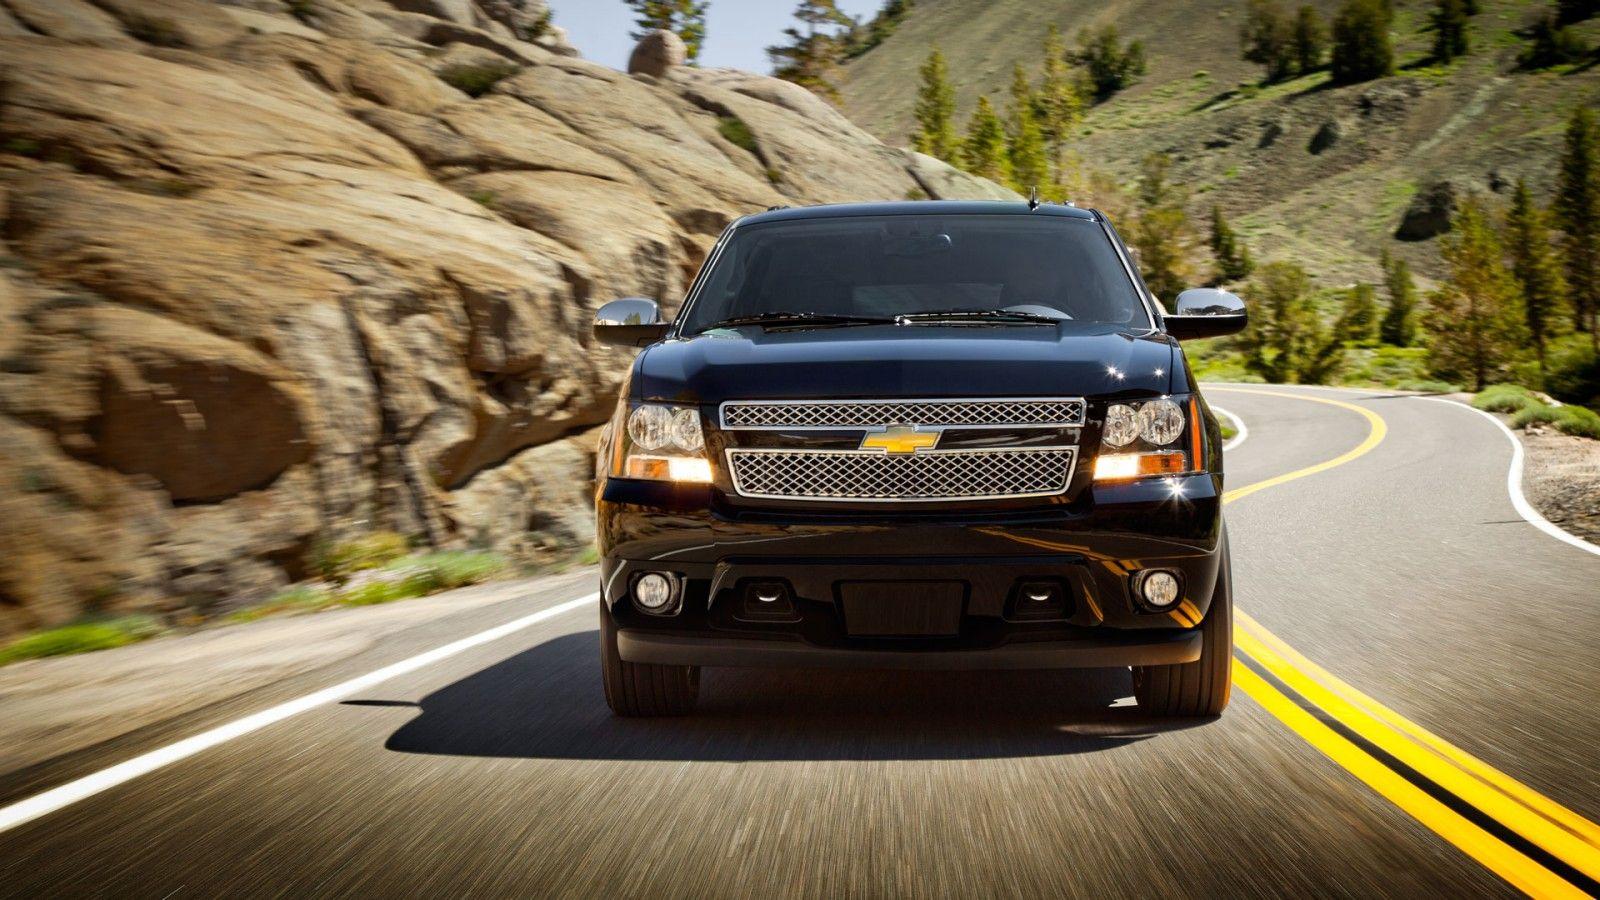 2014 Suburban Exterior Black Ltz Chevrolet Suburban Chevy Suburban Chevrolet